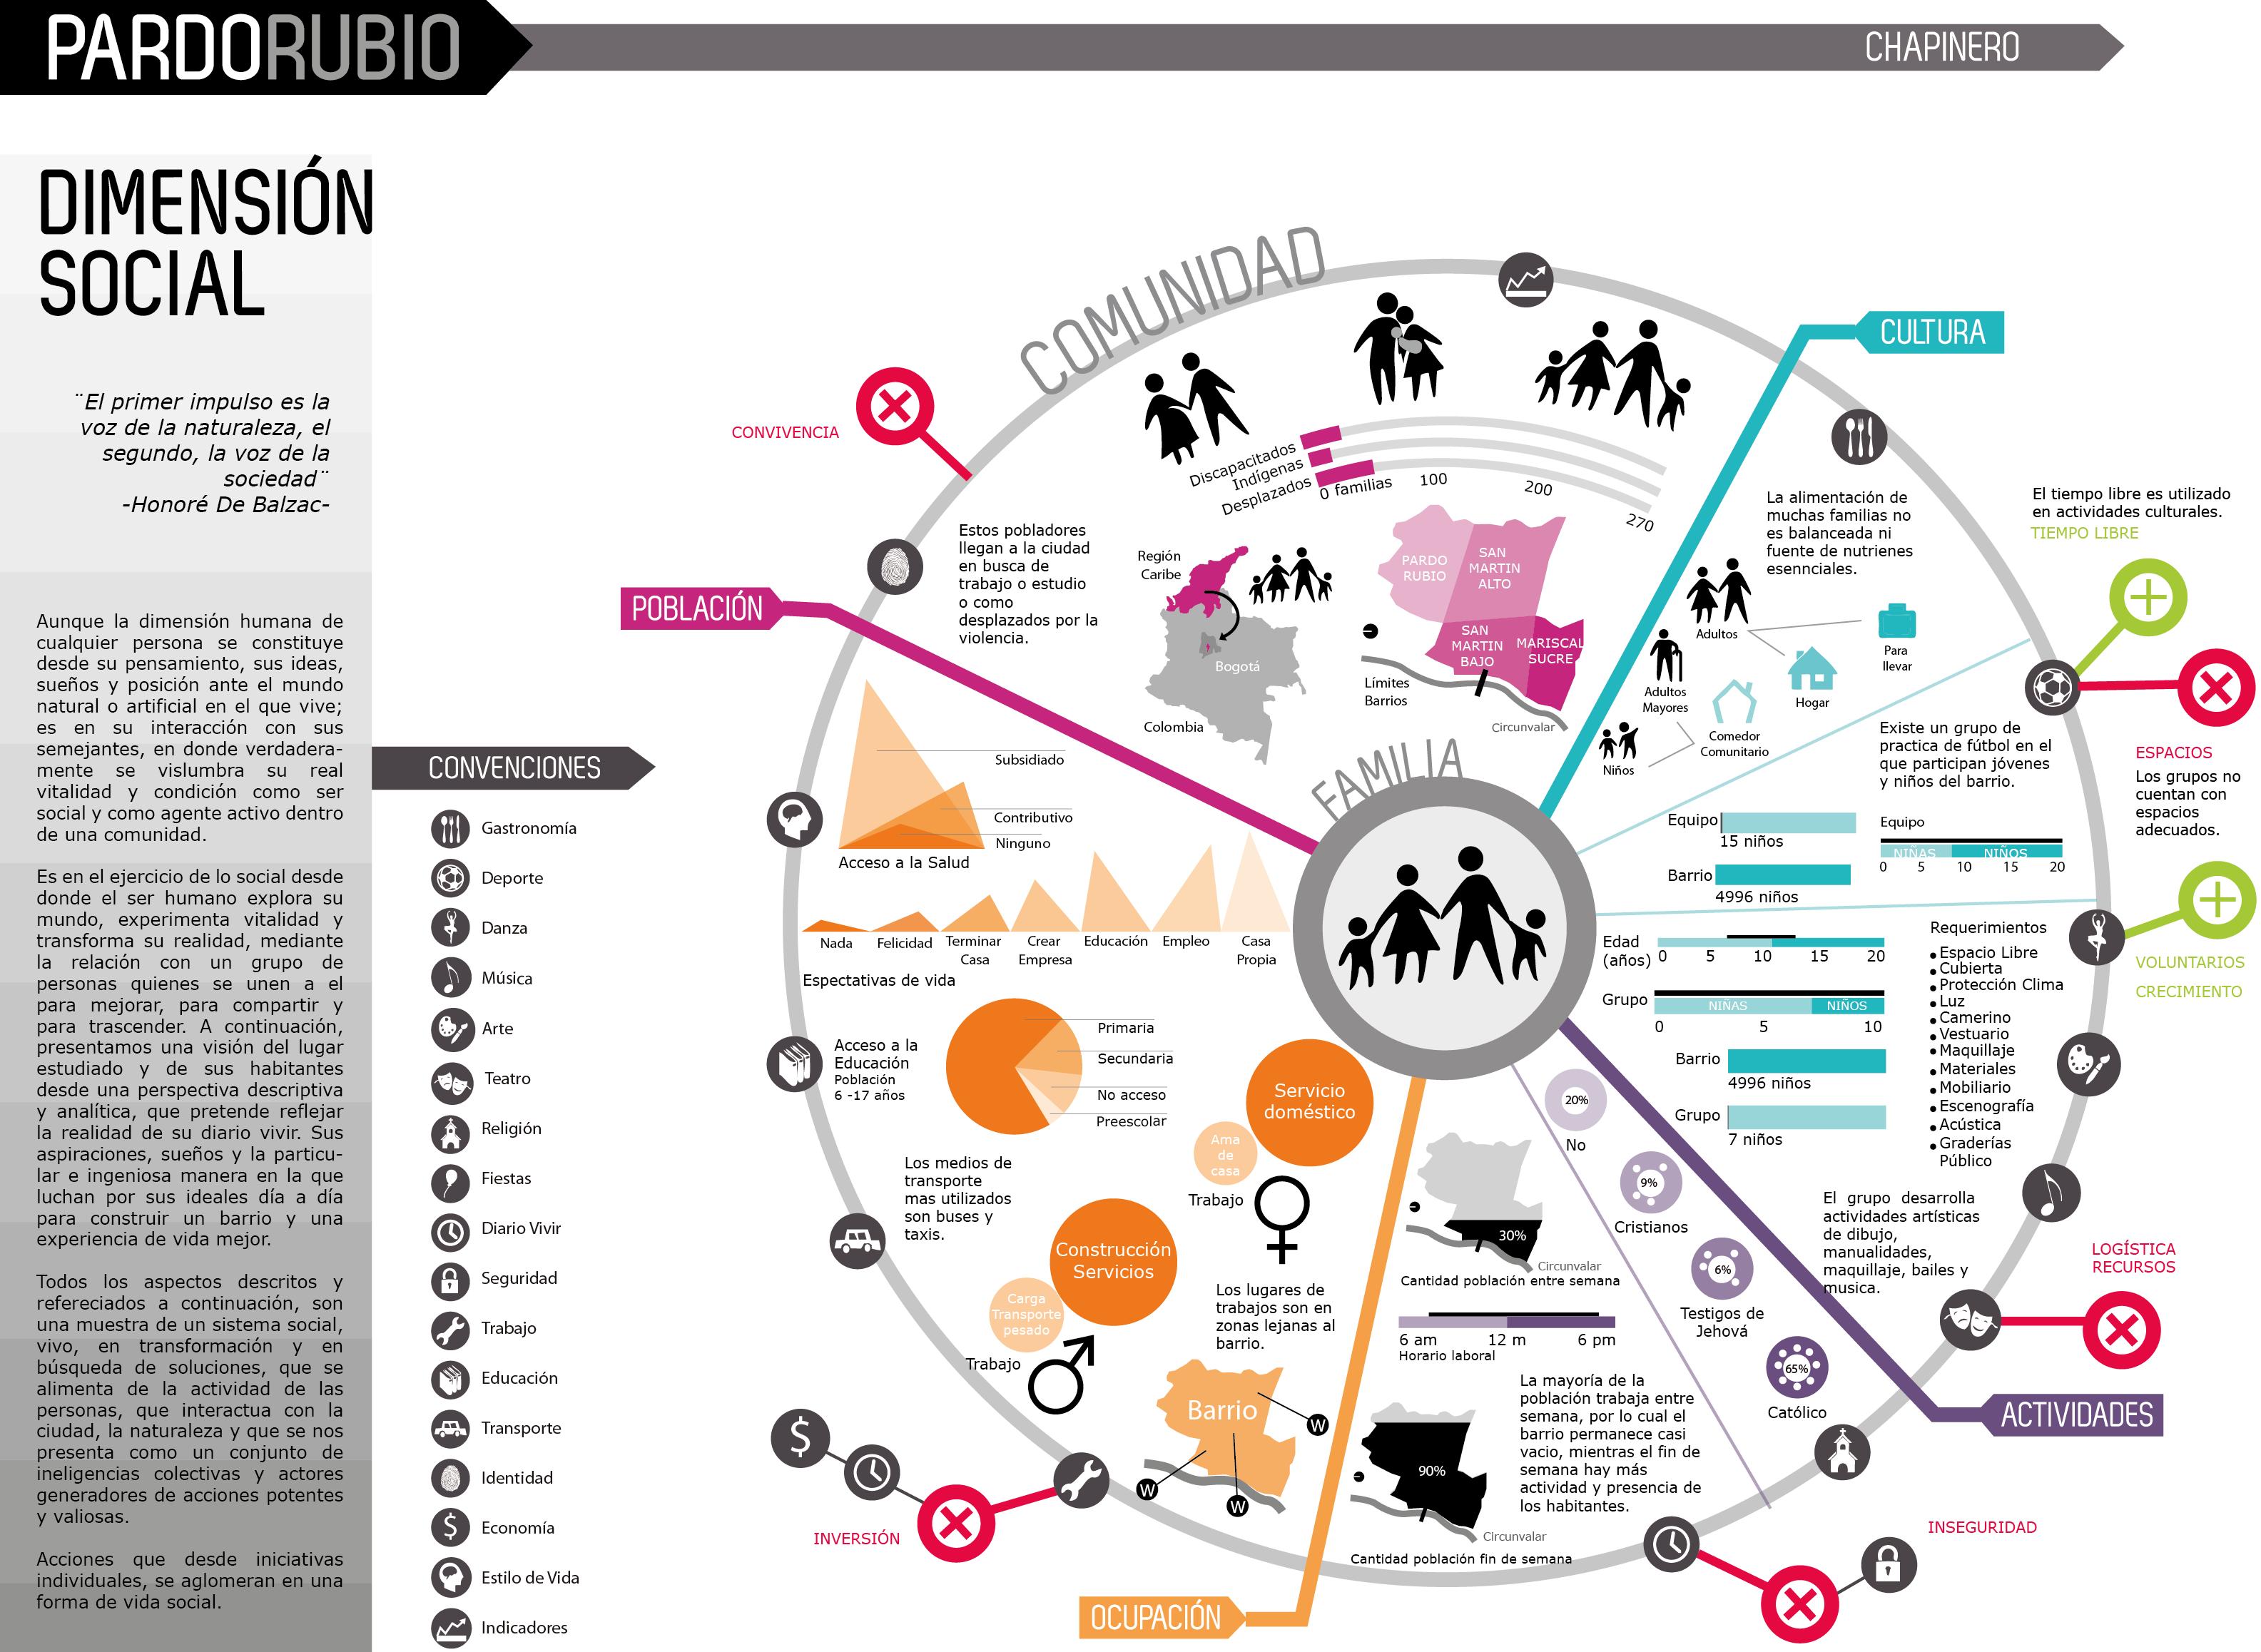 Paisajes interactivos lorena jaramillo pineda p gina 4 for Infografia arquitectura